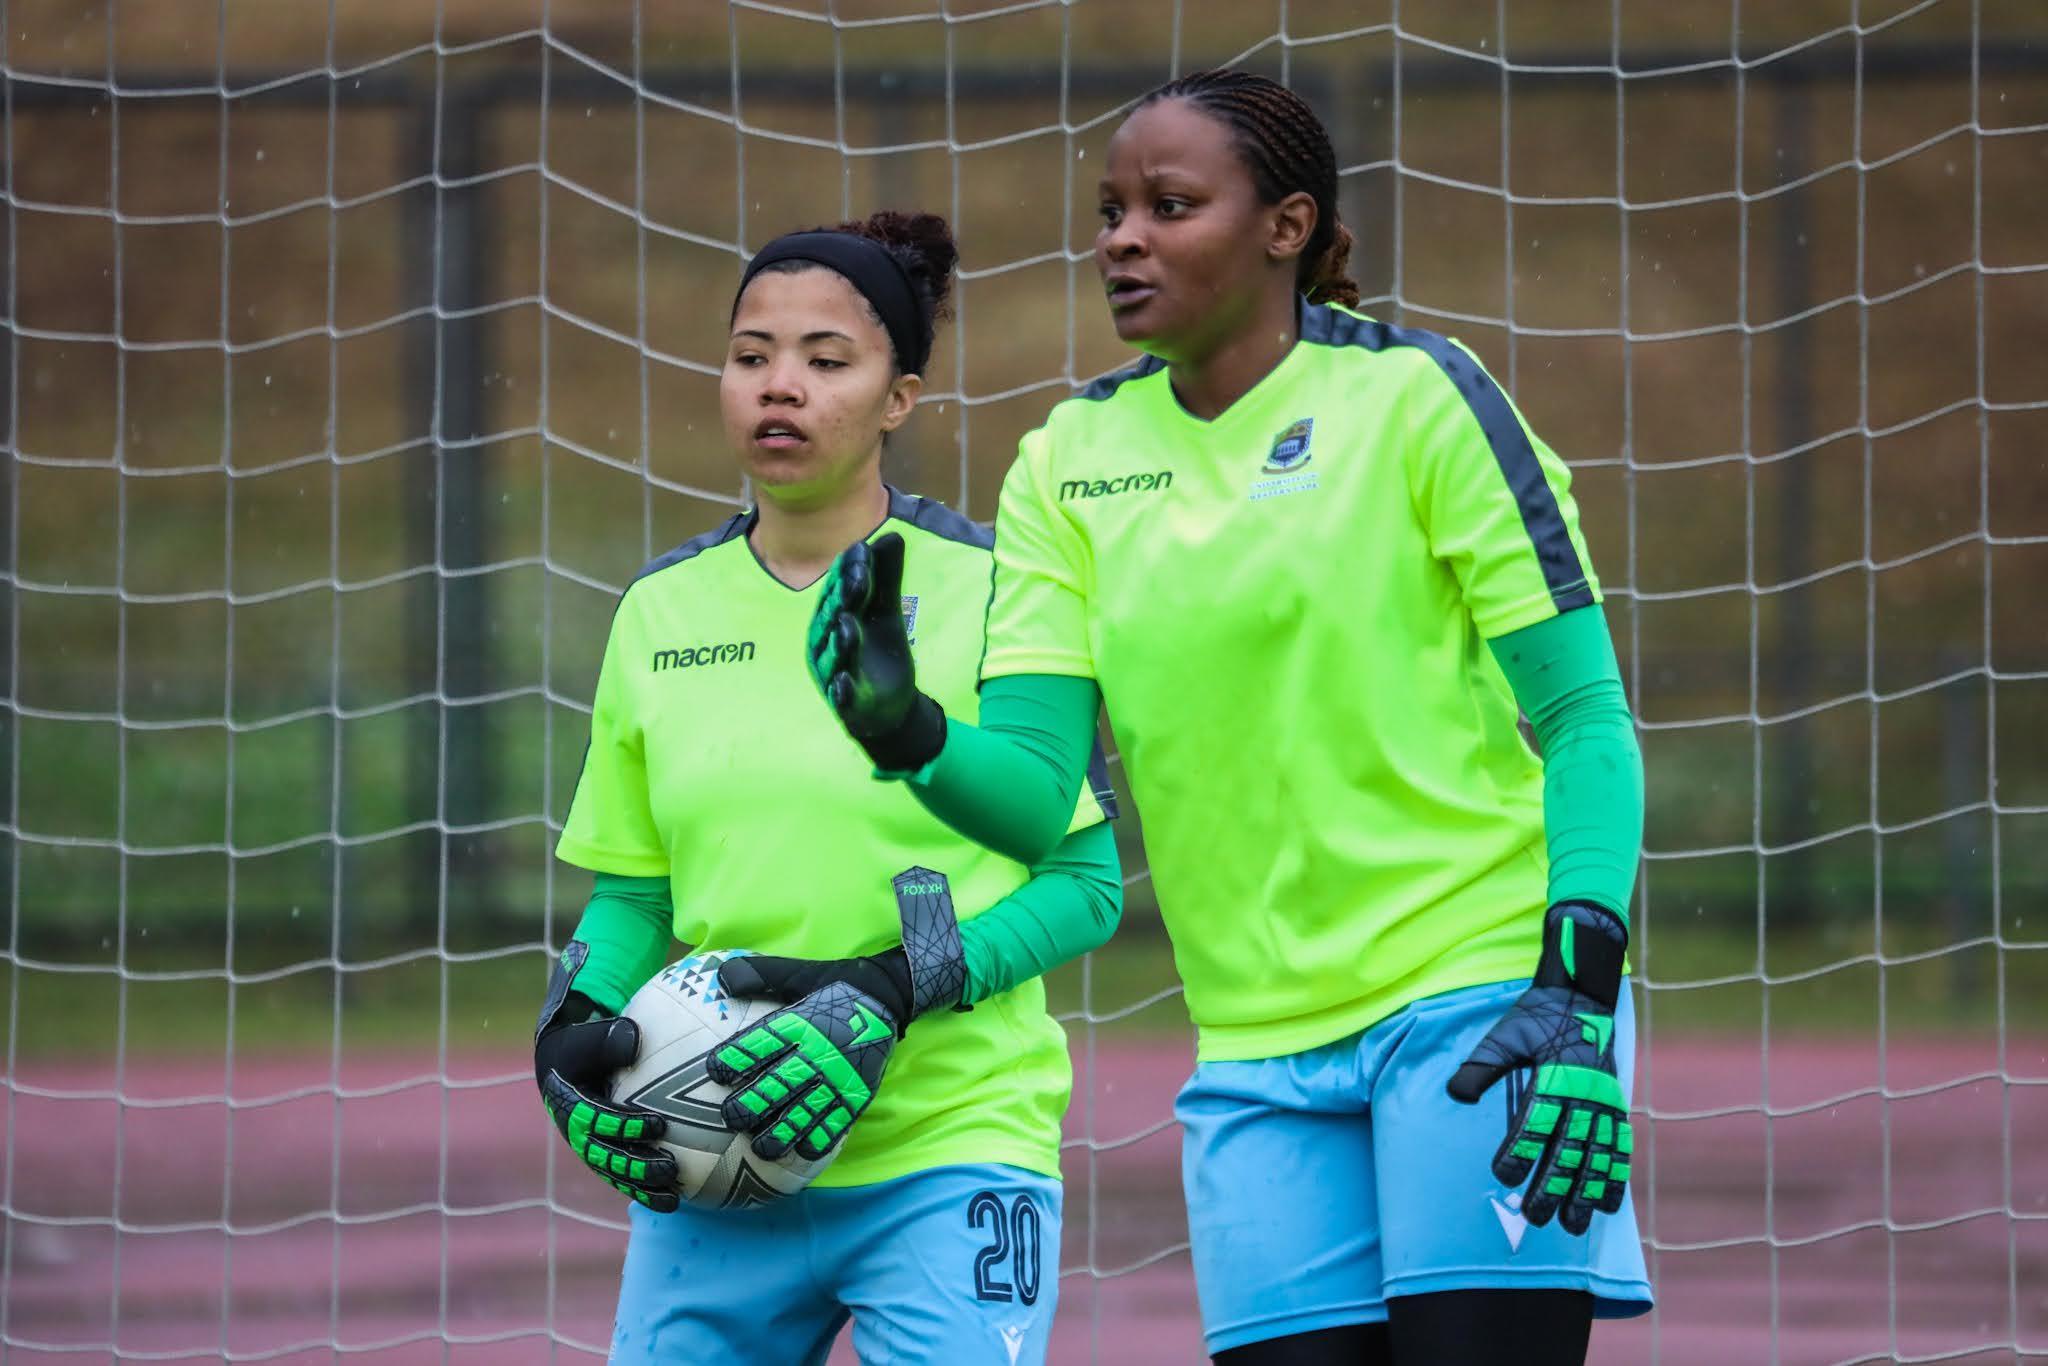 UWC goalkeepers Regirl Ngobeni and Kay-Dee Windvogel